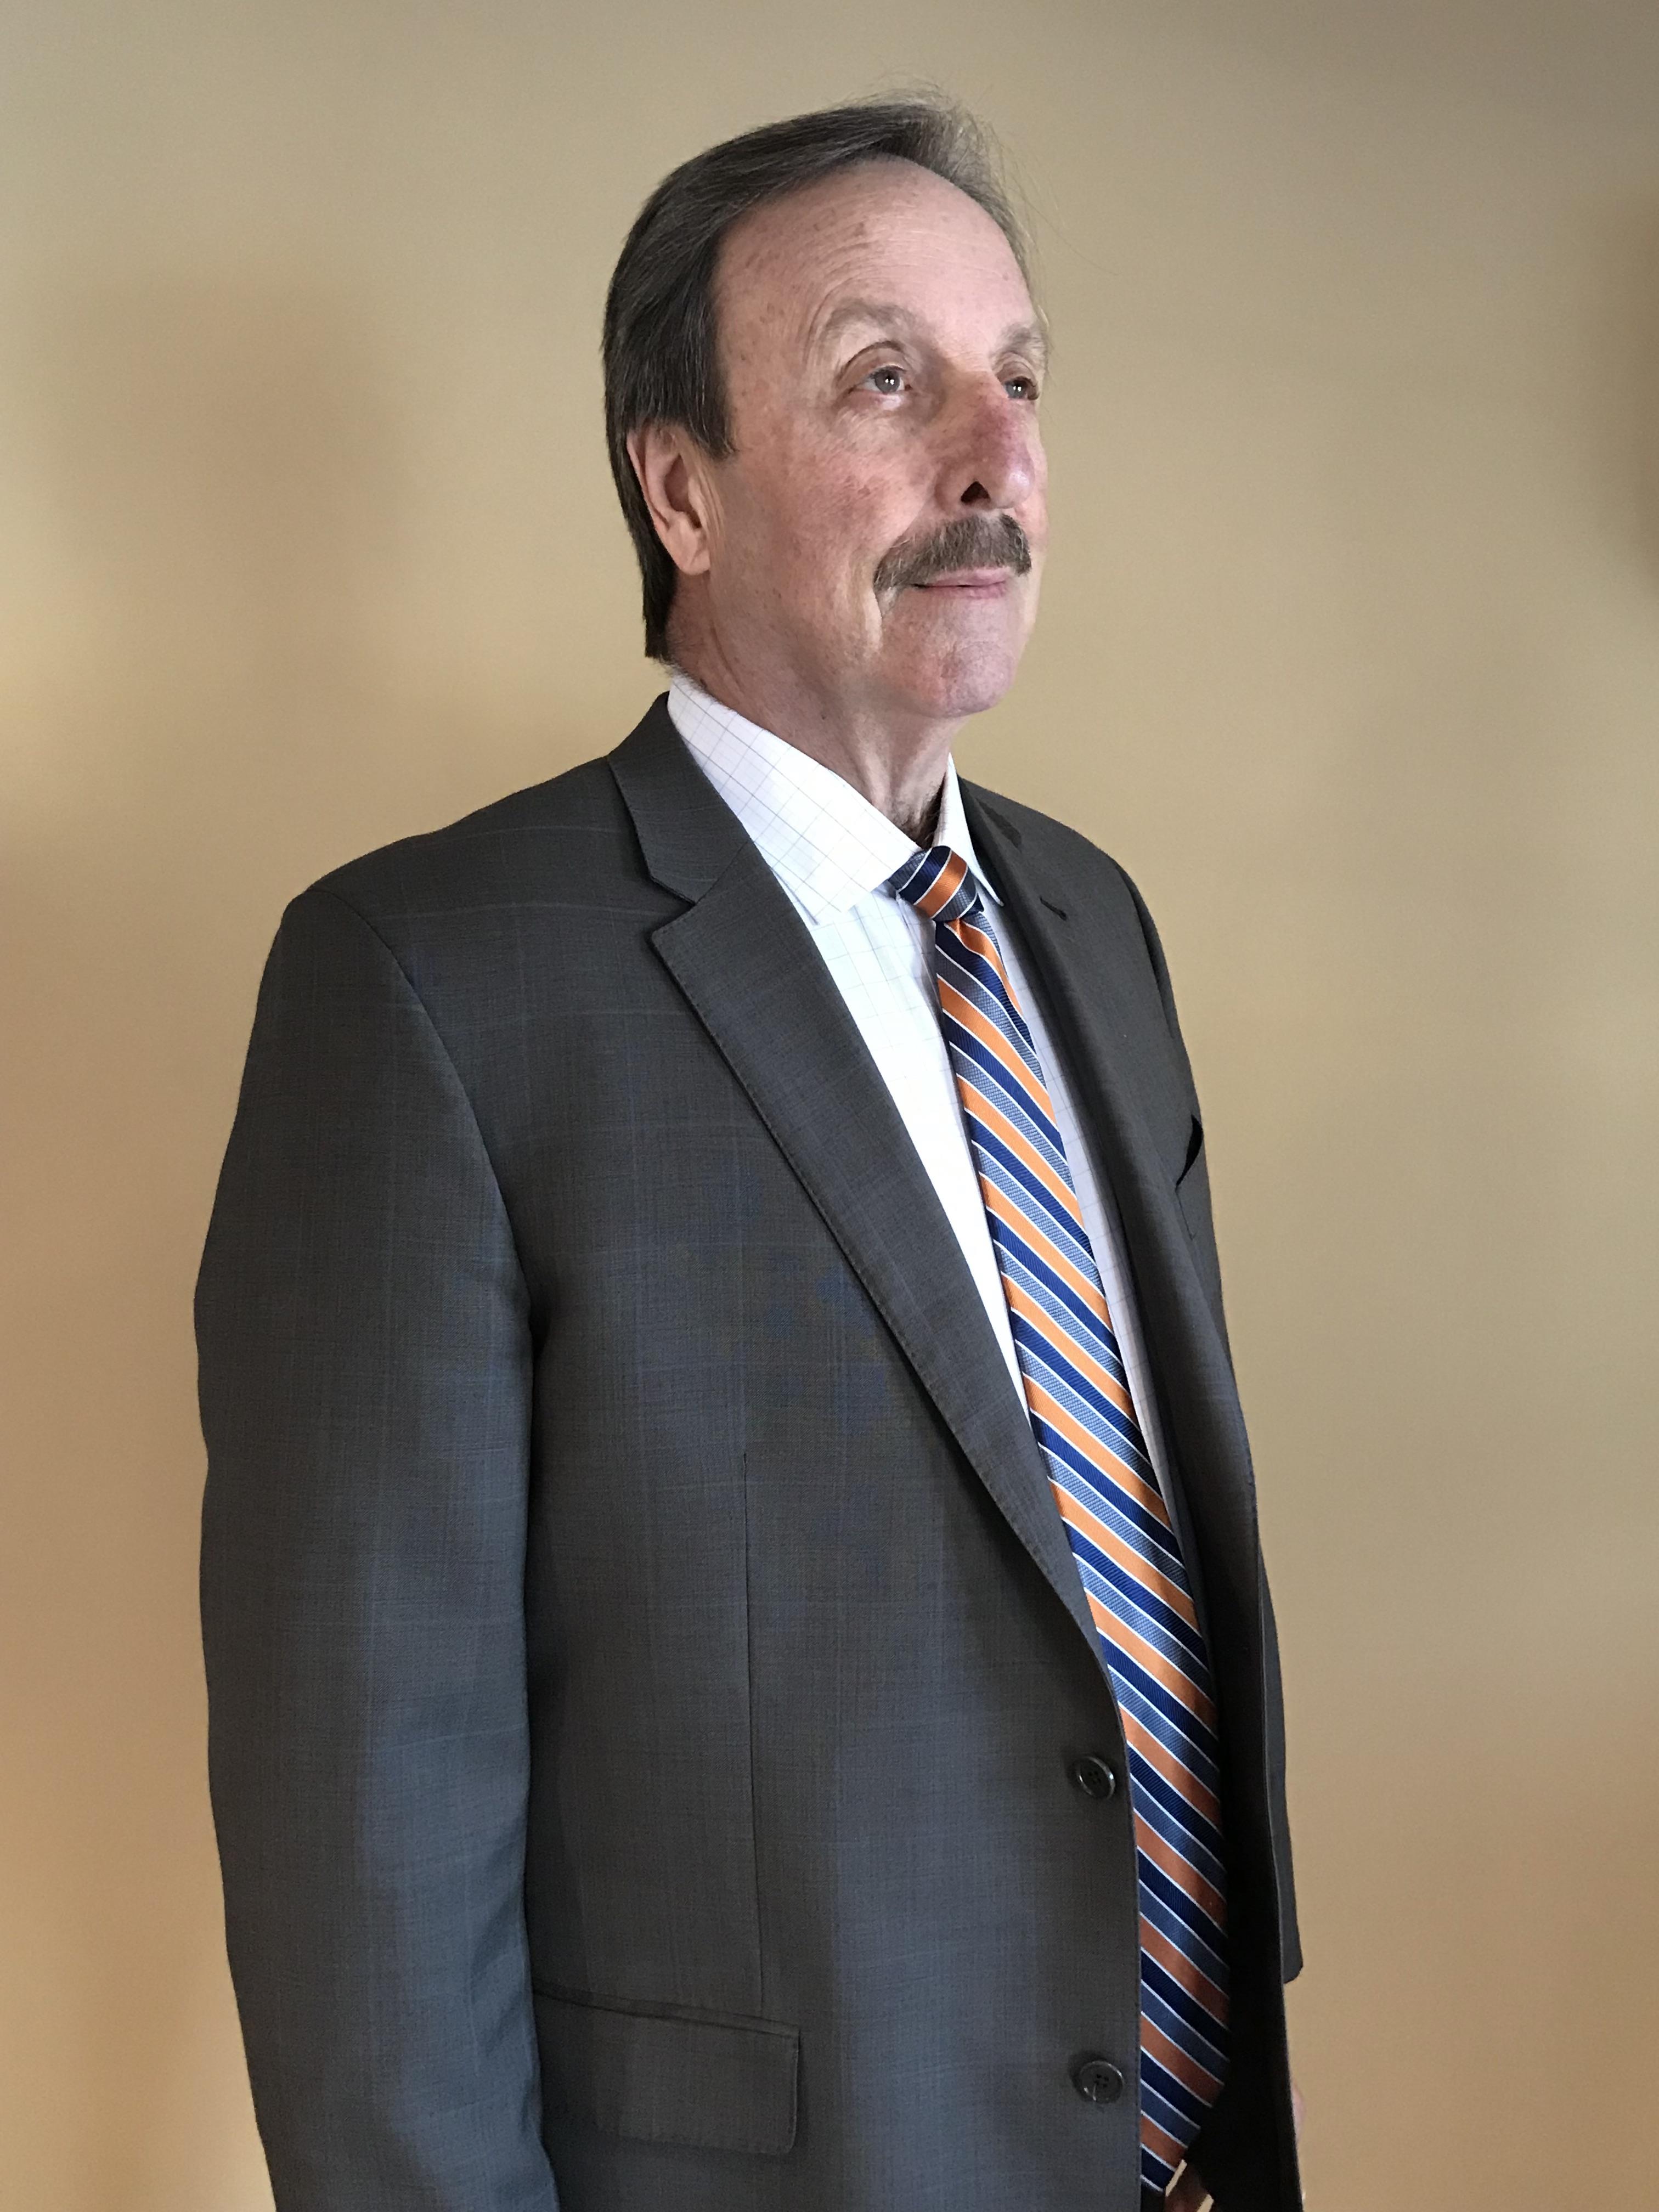 Ron Showalter